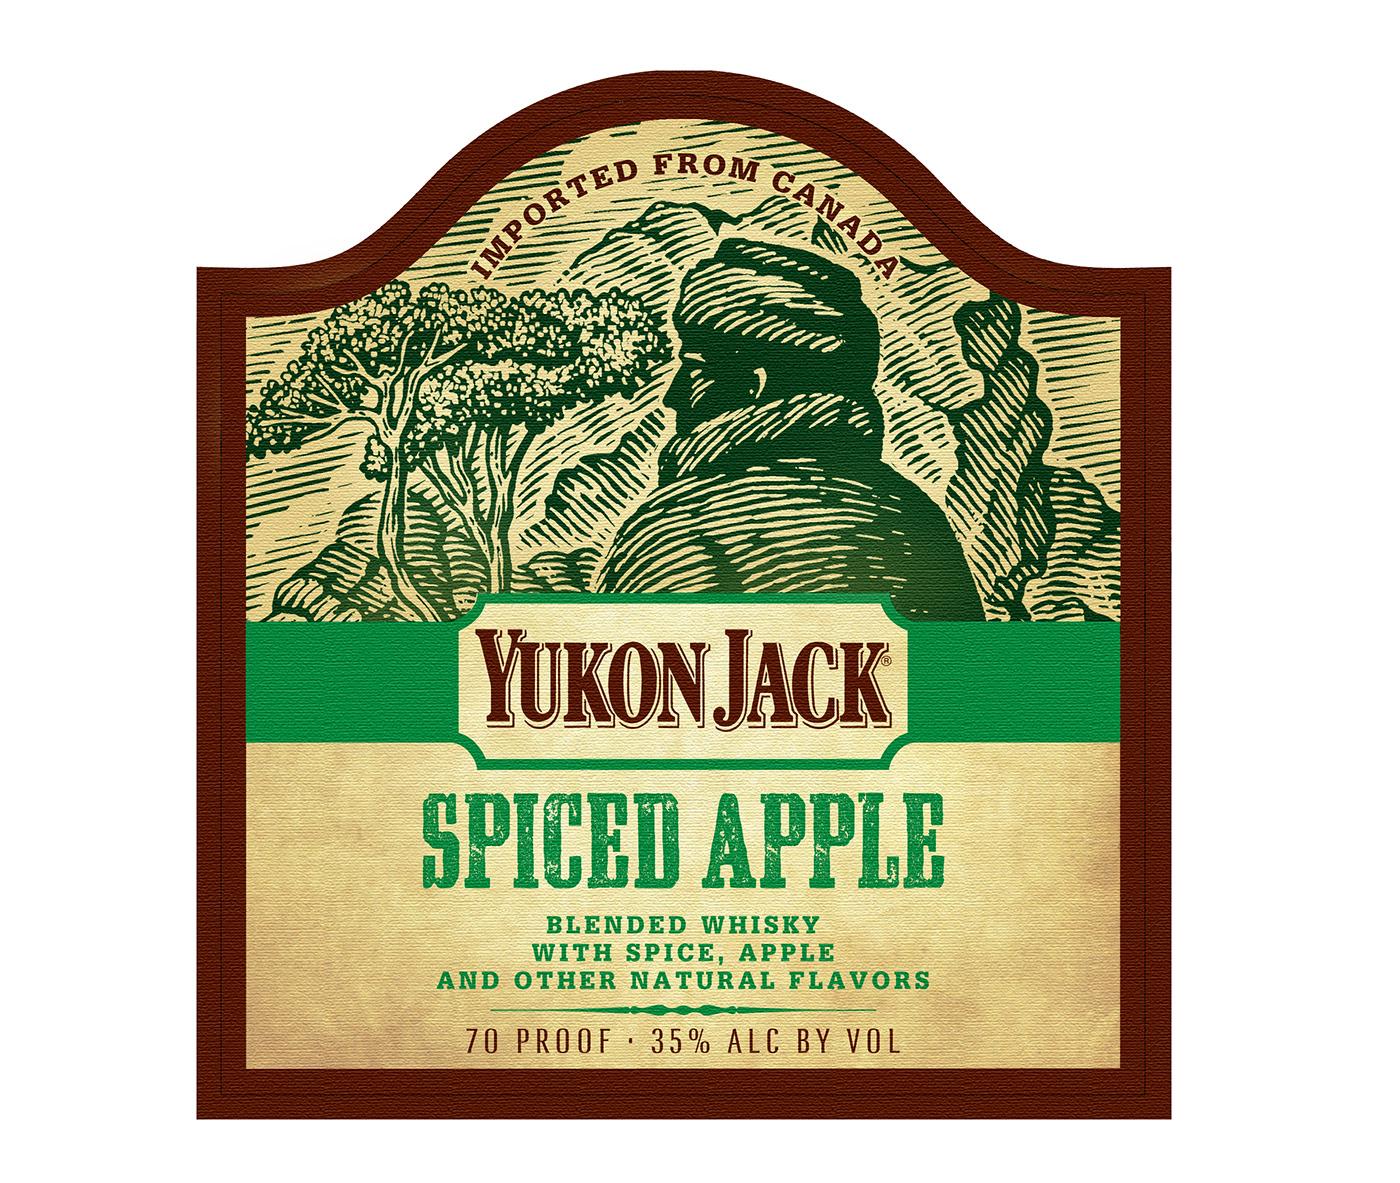 Yukon Jack Whiskey Labels Illustrated By Steven Noble On Behance